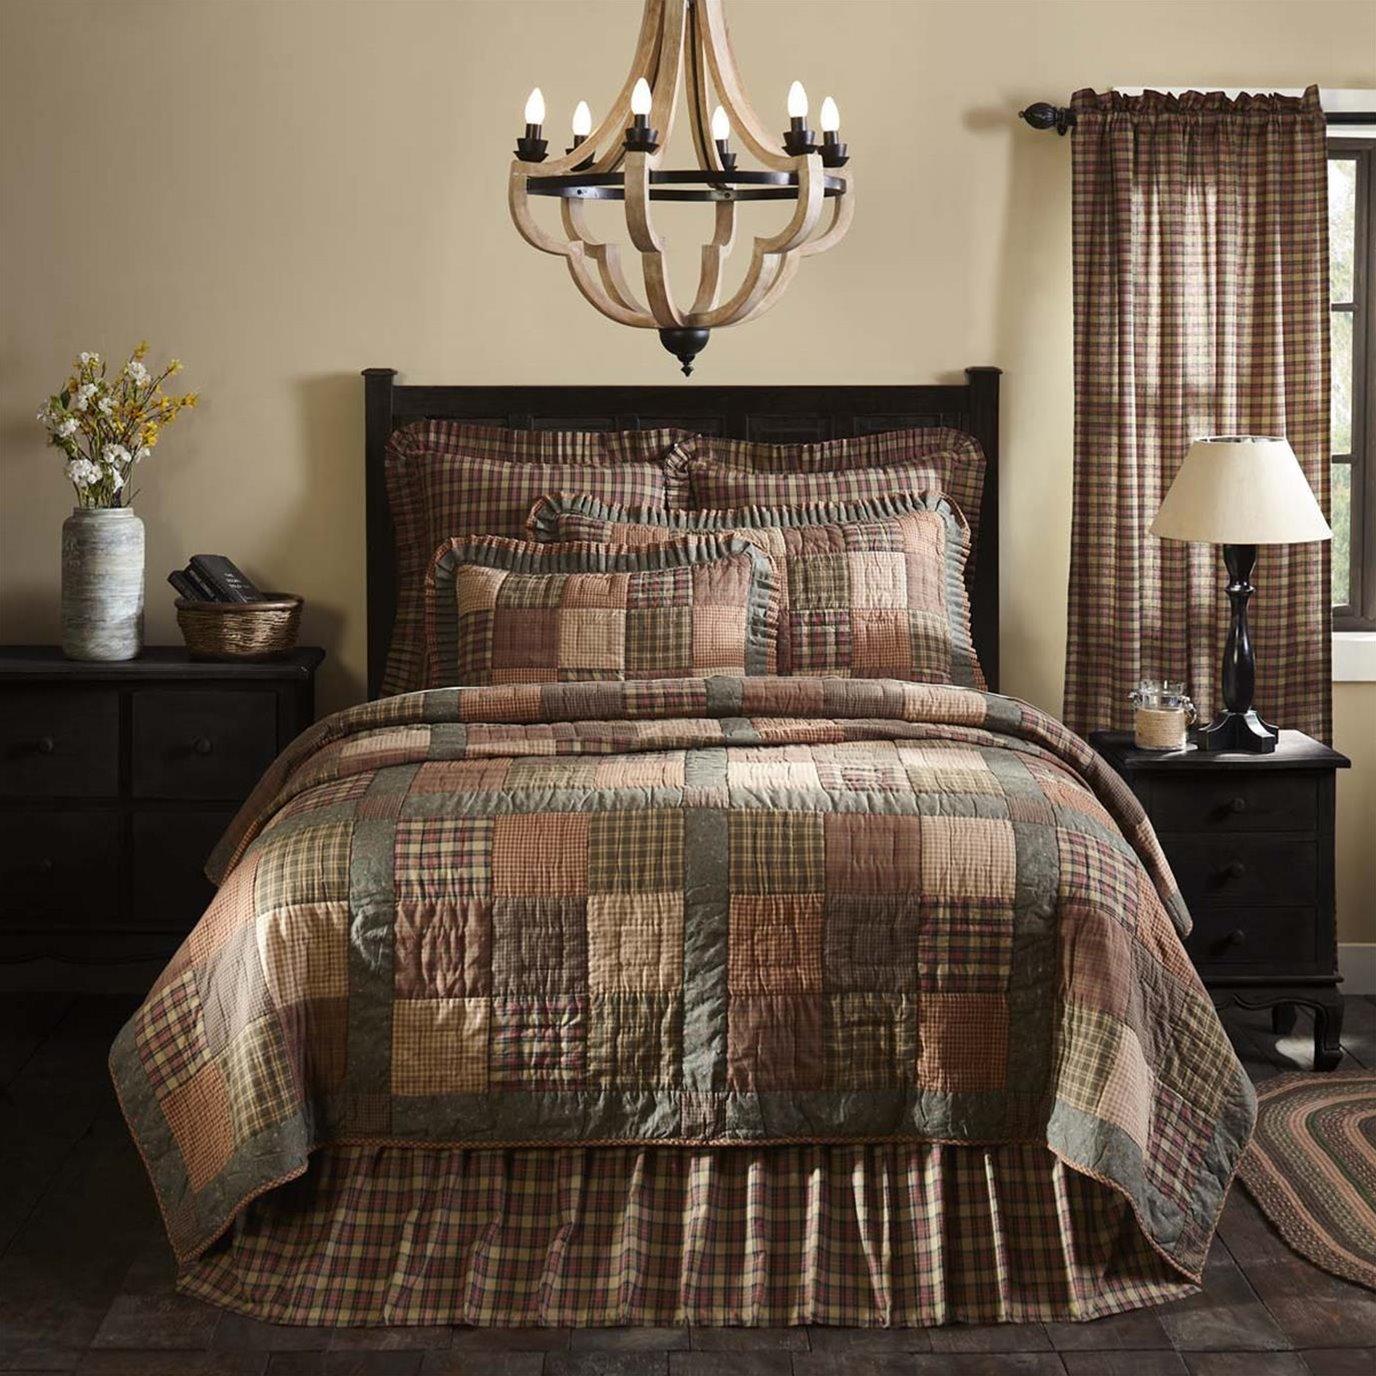 Crosswoods King Quilt 105Wx95L